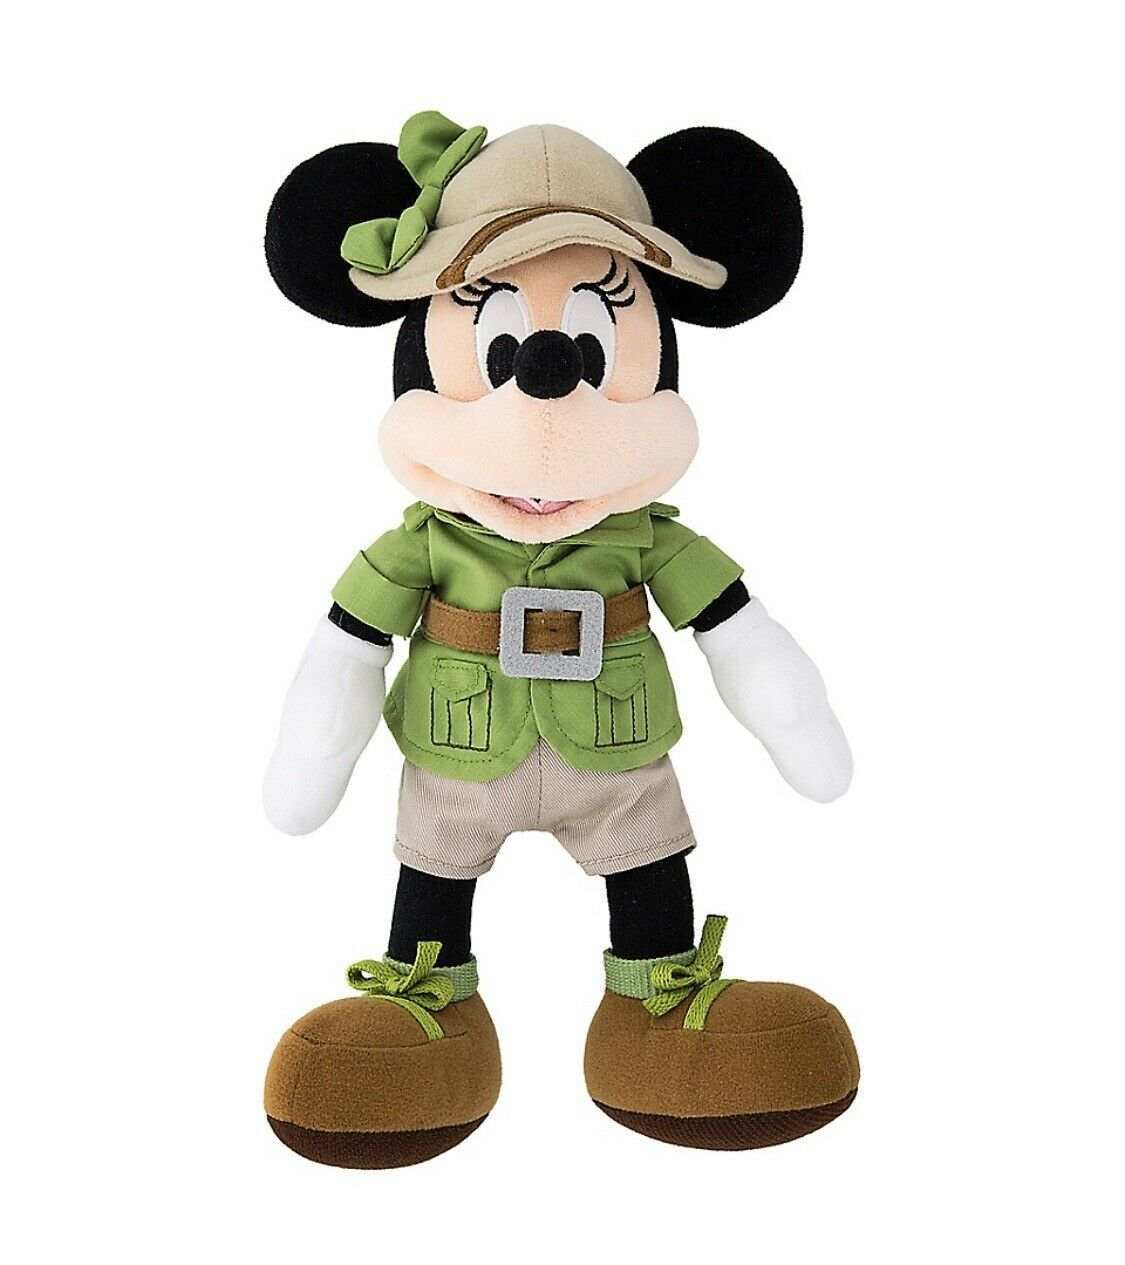 Disney Parks 9 inc Minnie Mouse Safari Plush New with Tags